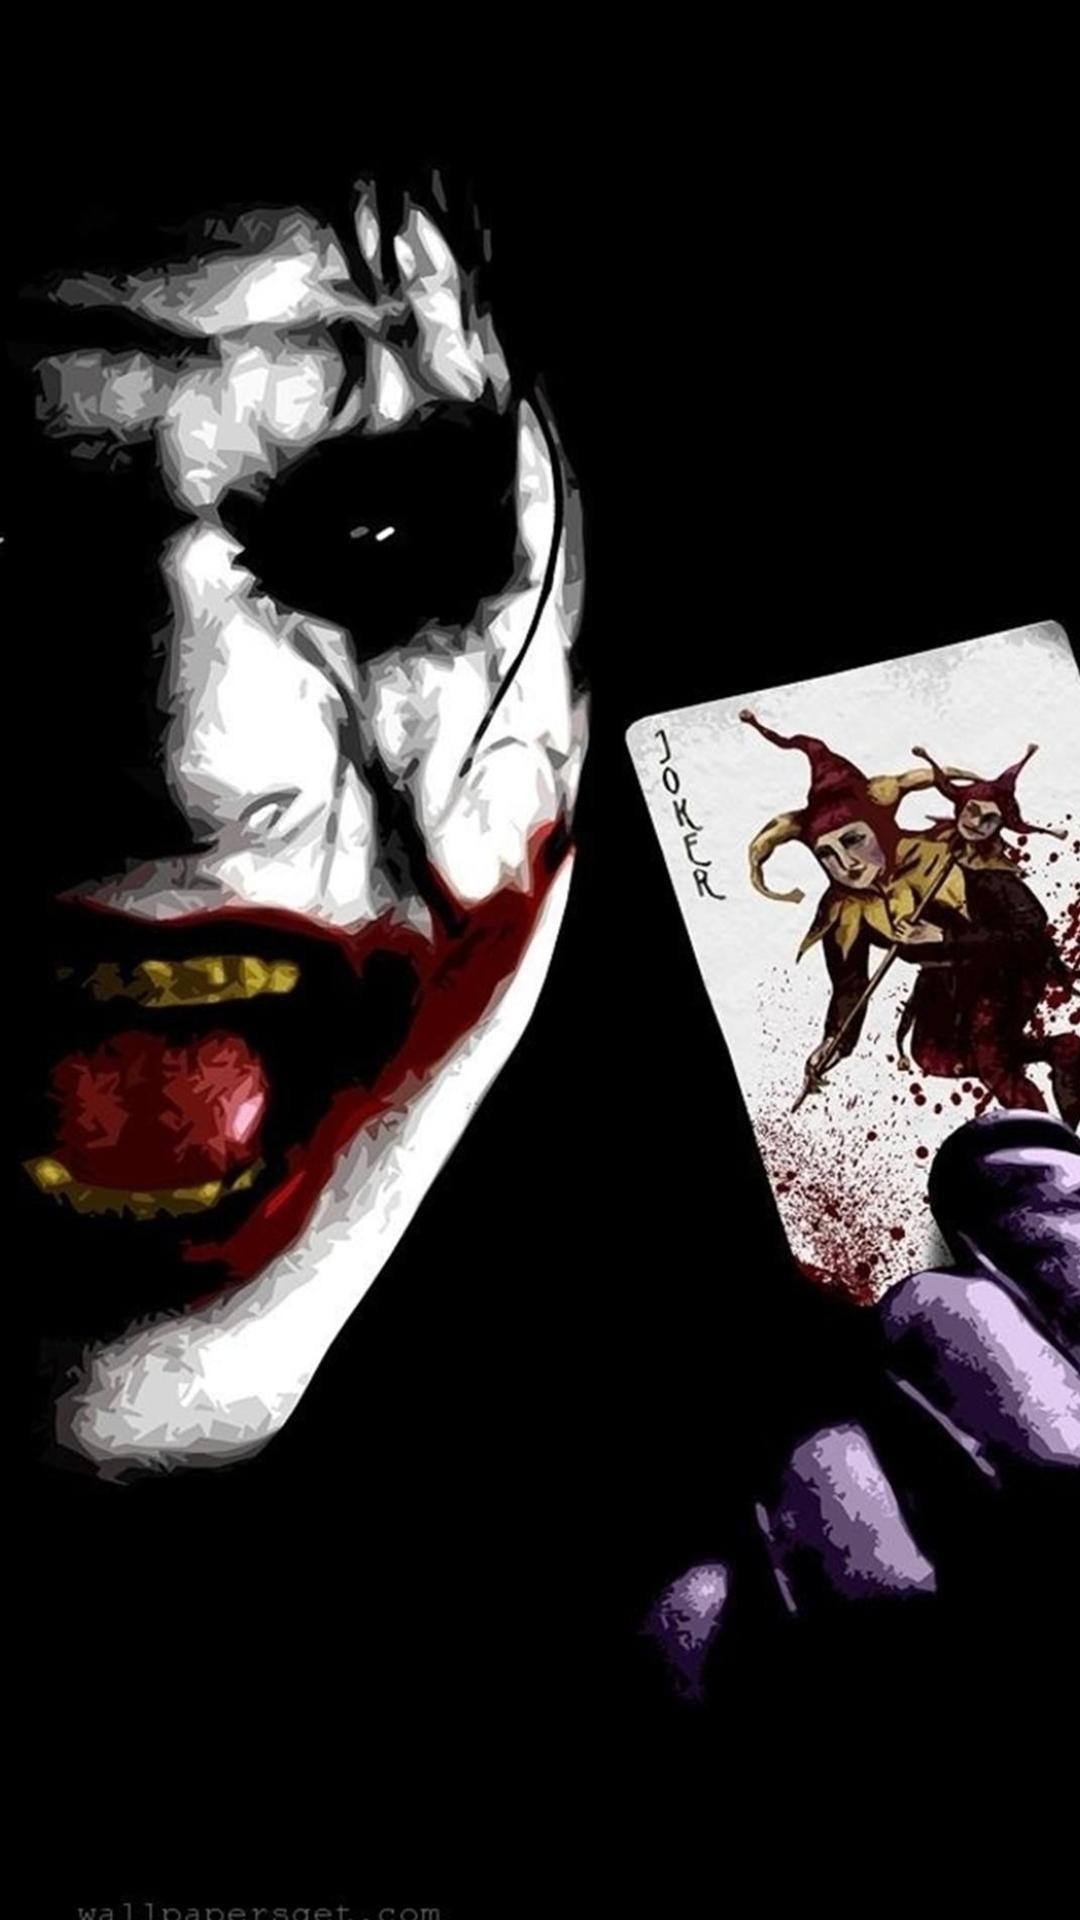 Joker Hd Wallpapers for iPhone. iPhone 6